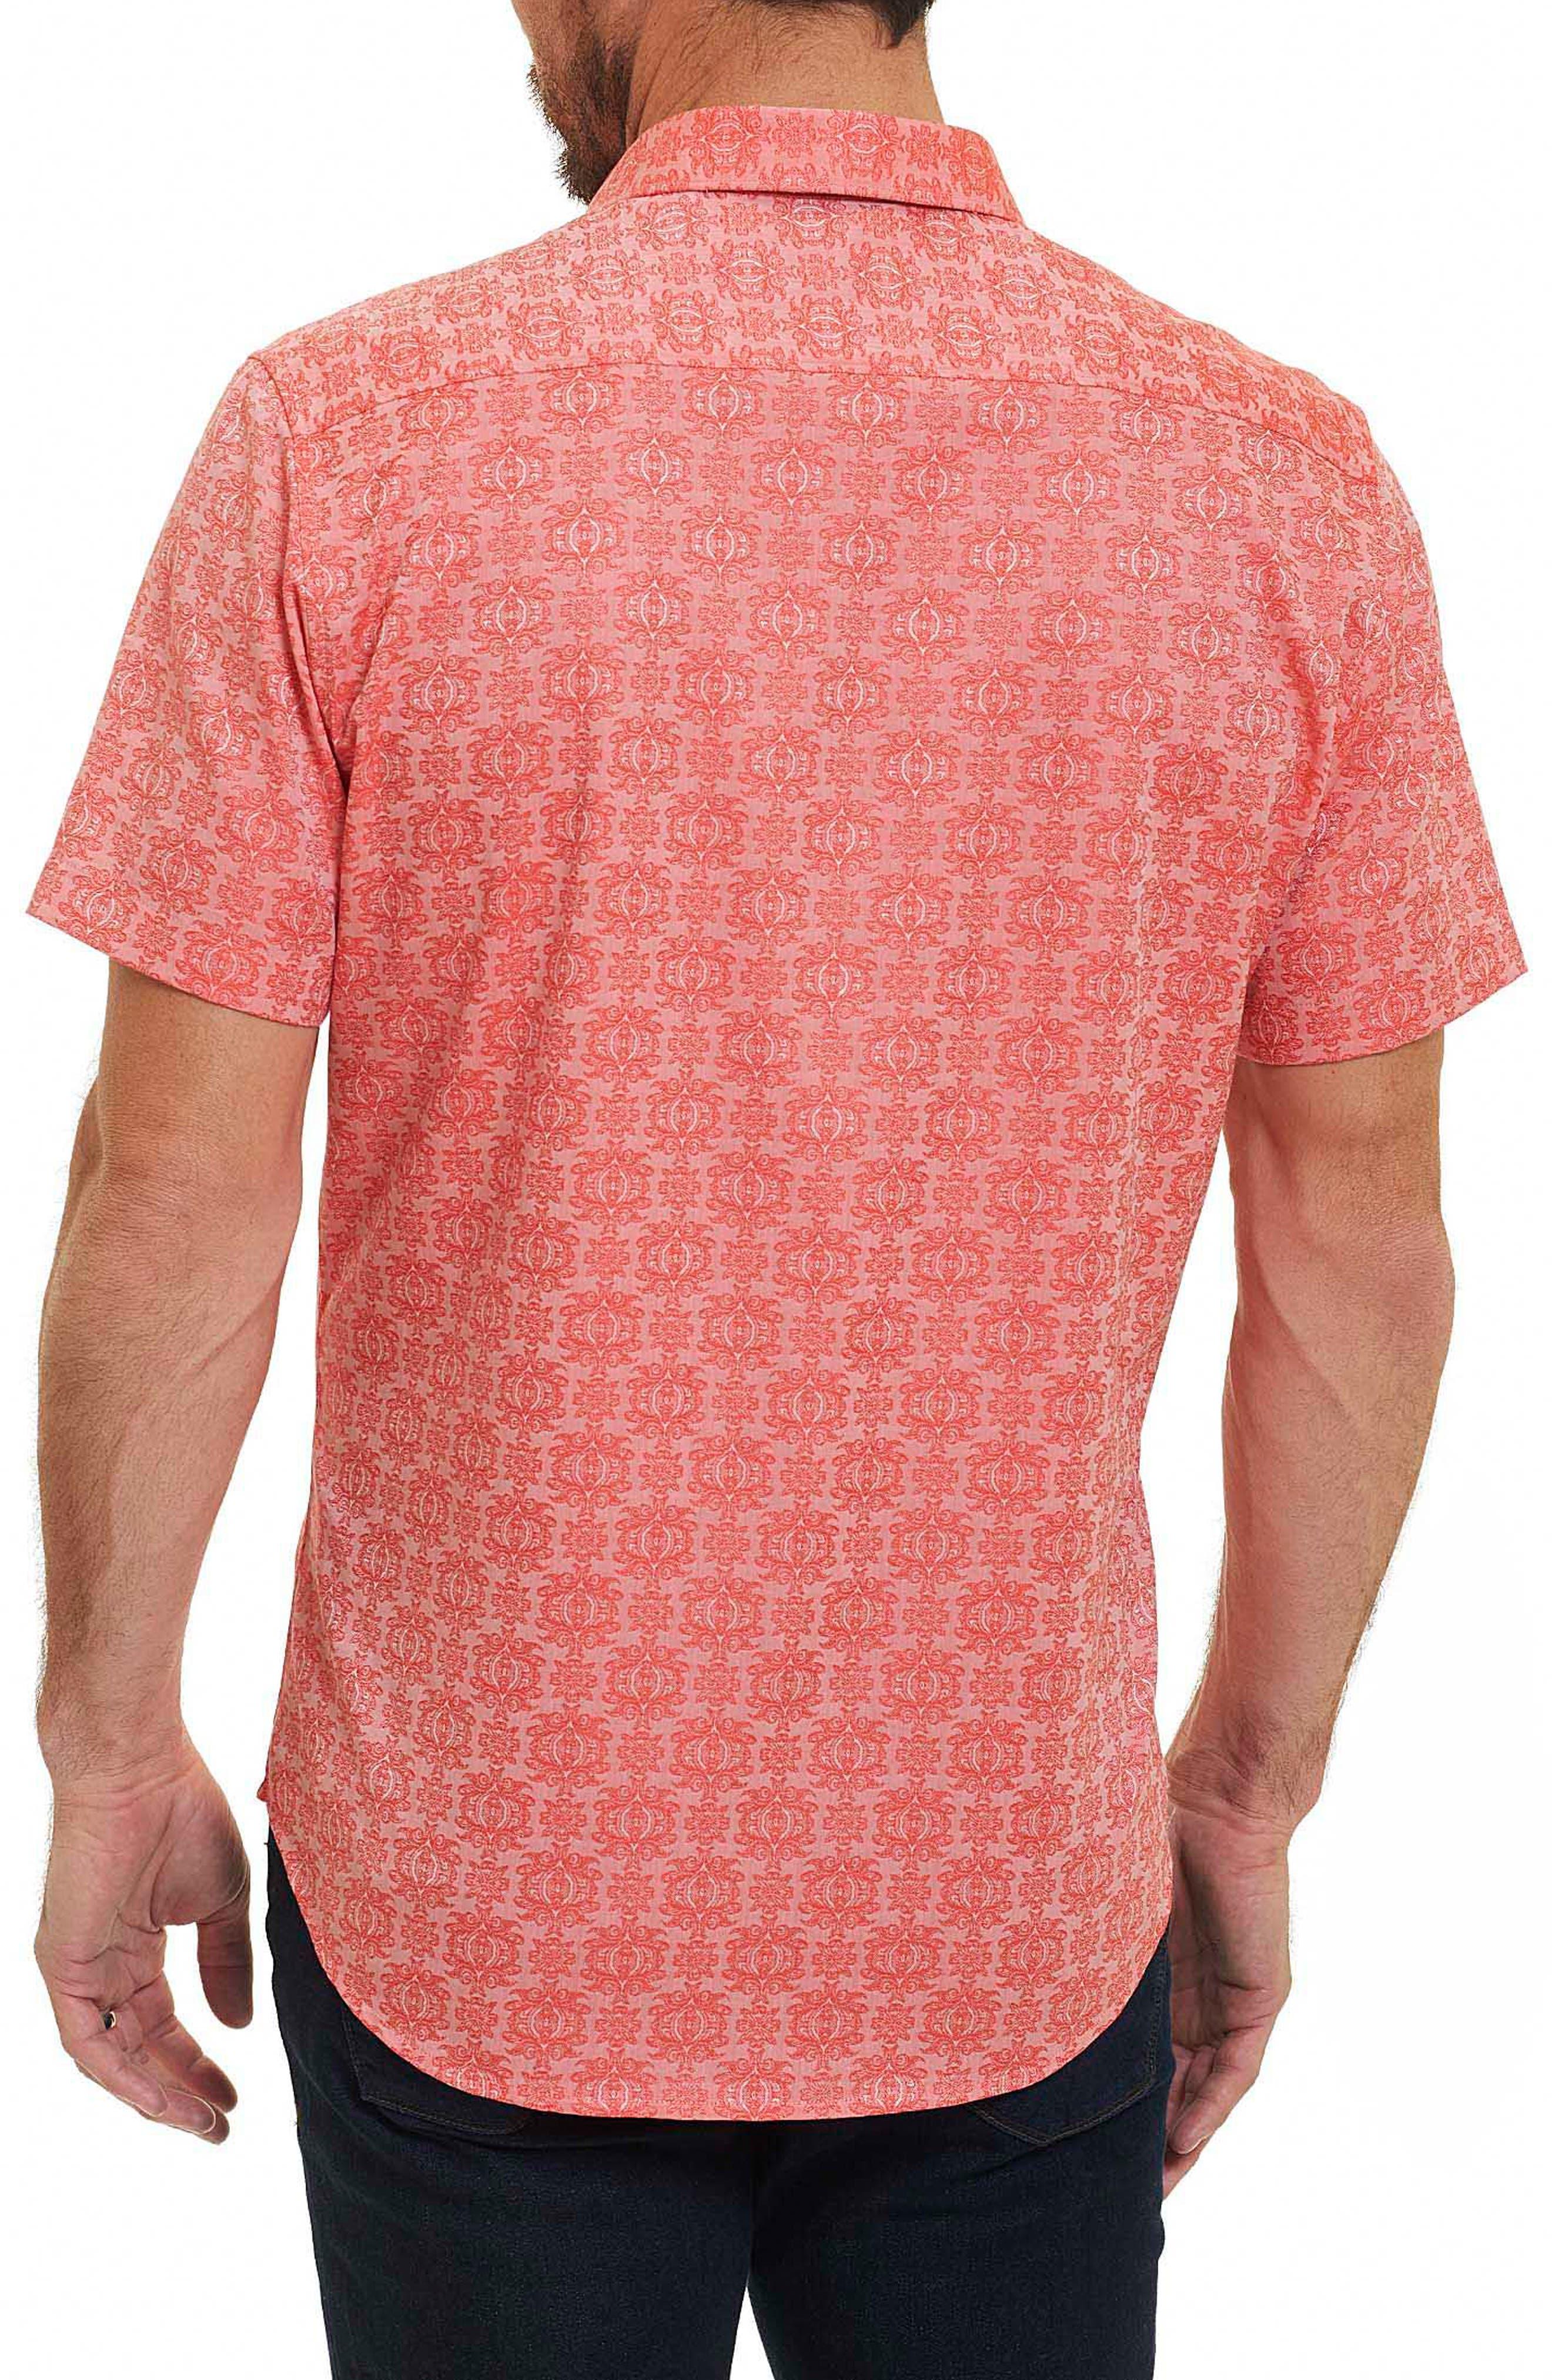 Cullen Regular Fit Sport Shirt,                             Alternate thumbnail 2, color,                             Coral